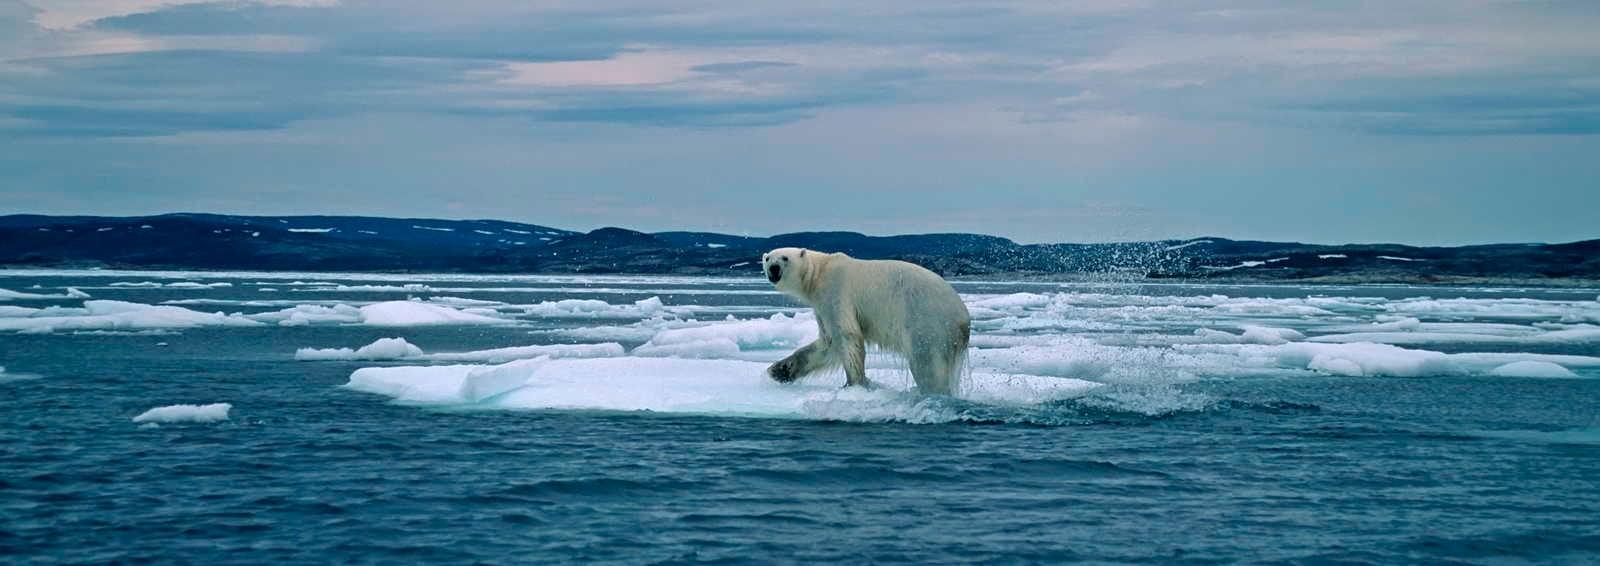 Polar Bear, Canadian Arctic